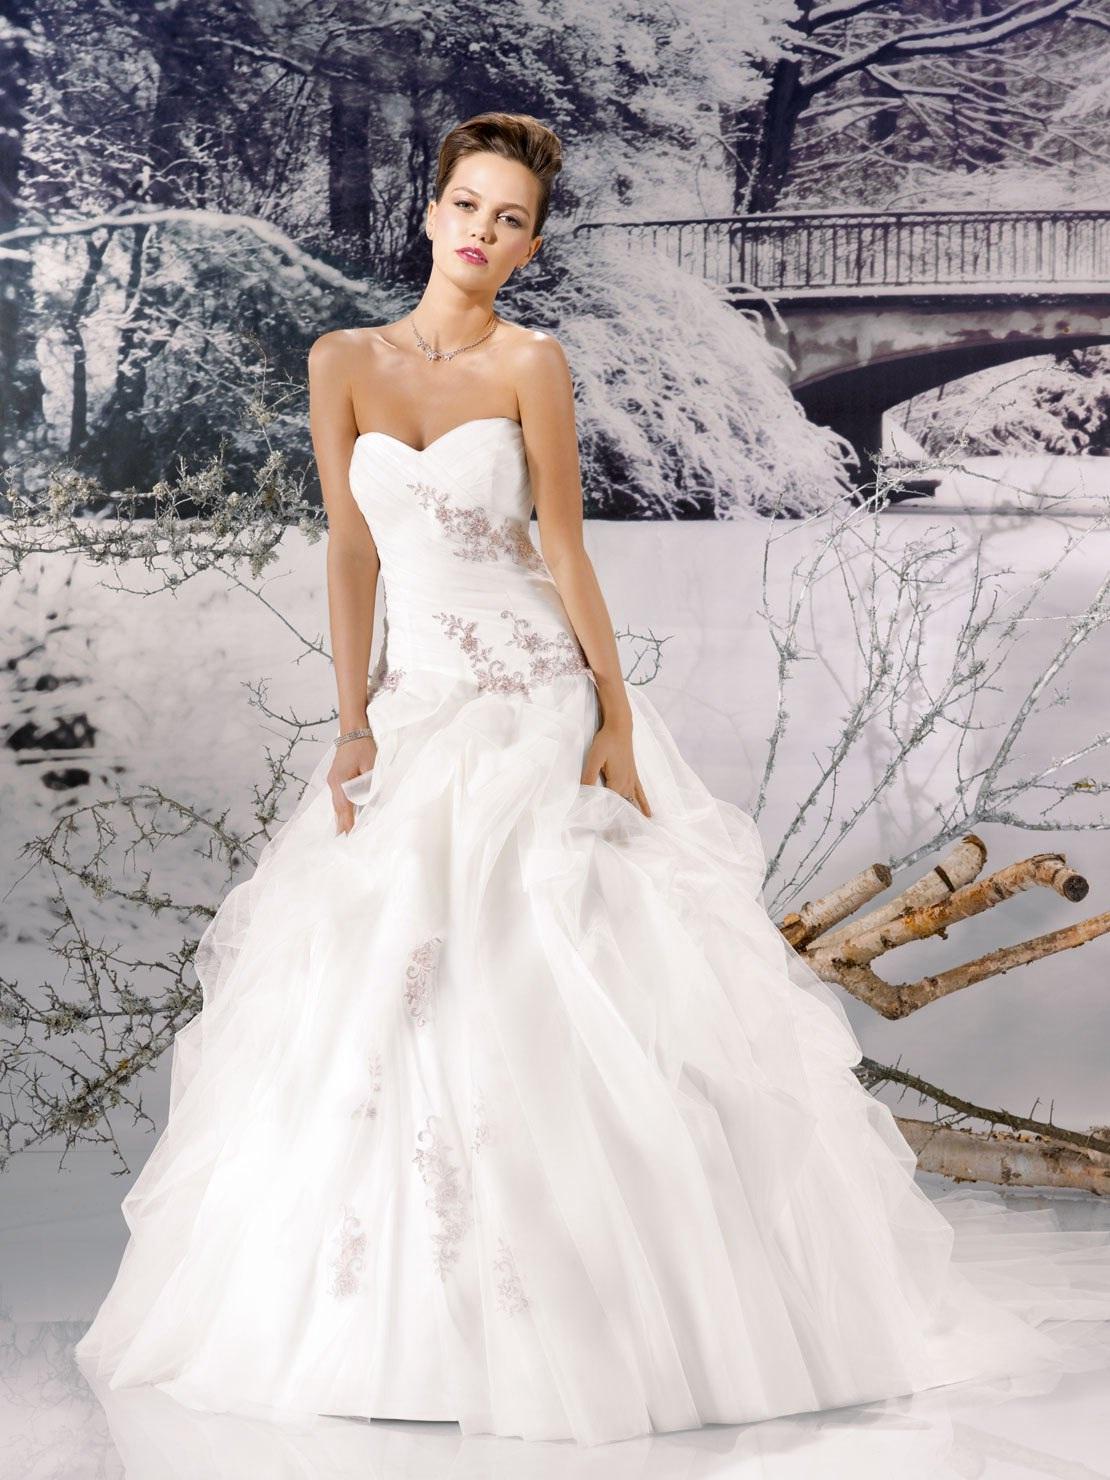 Miss paris spring 2013 bridal wedding dresses for Wedding dress in paris